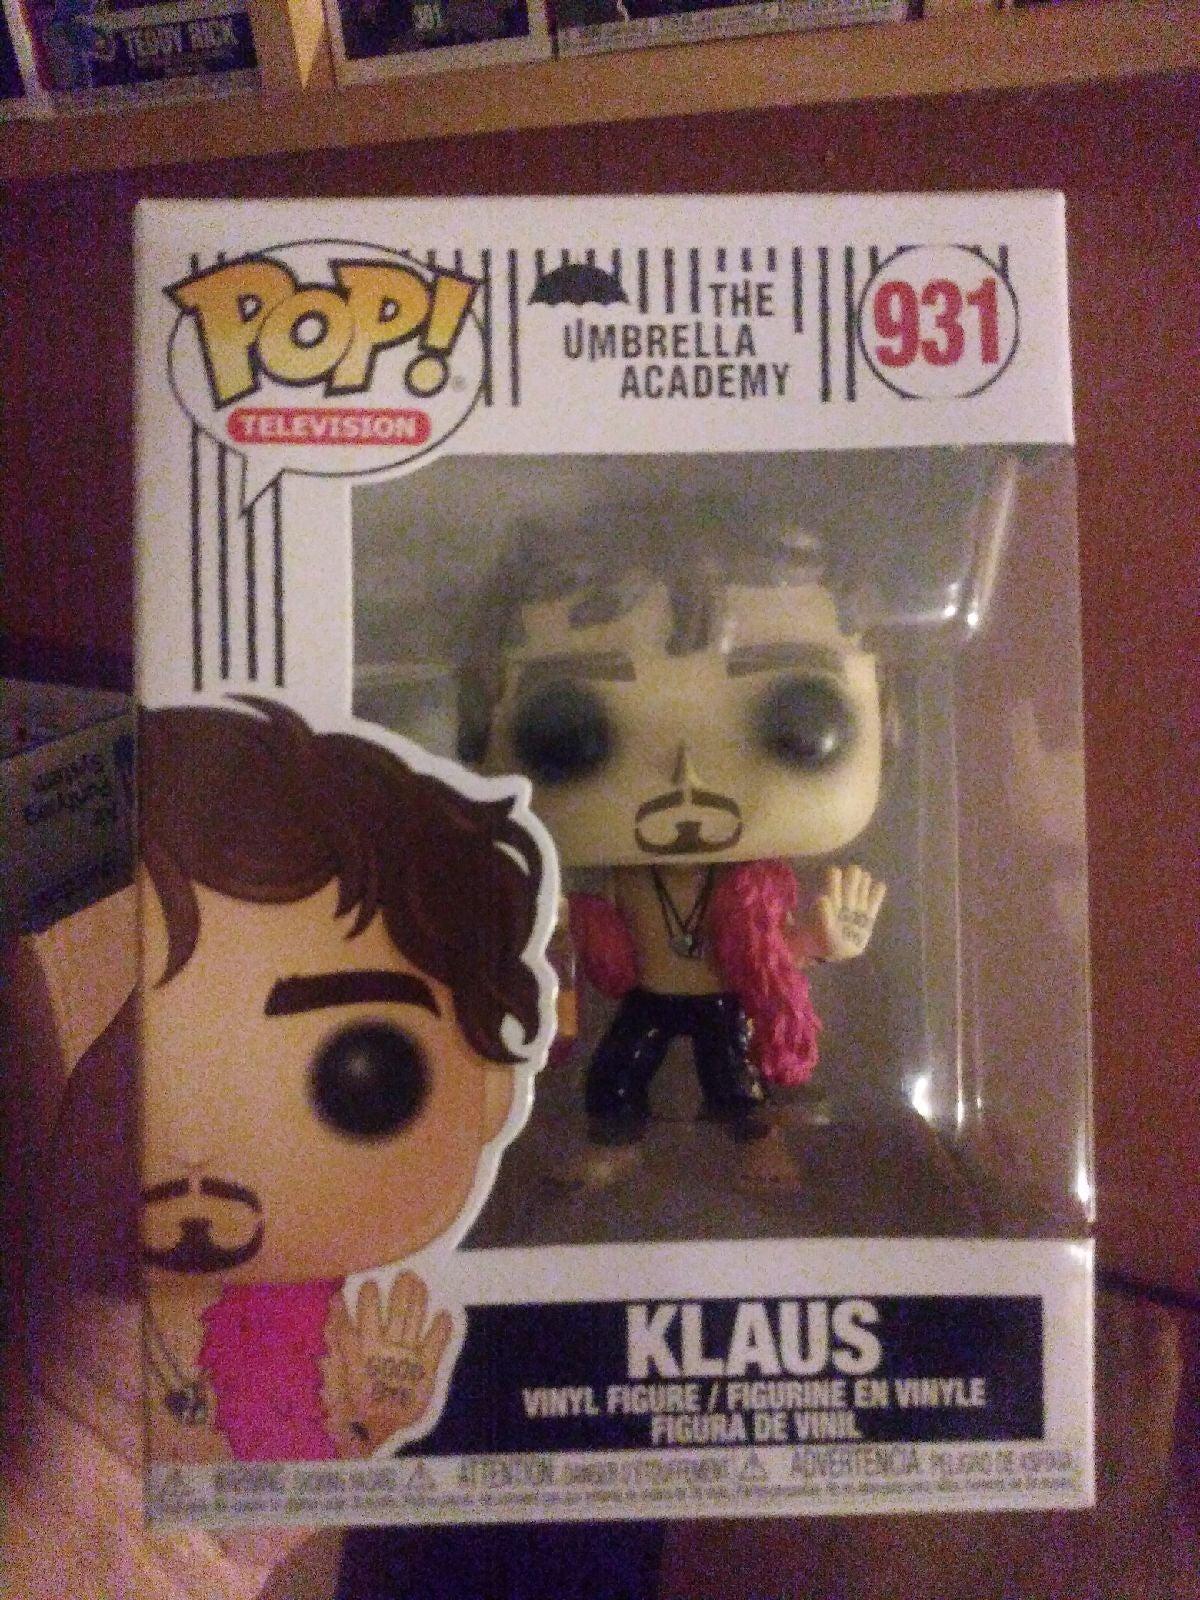 Klaus Funko Pop! (umbrella academy)